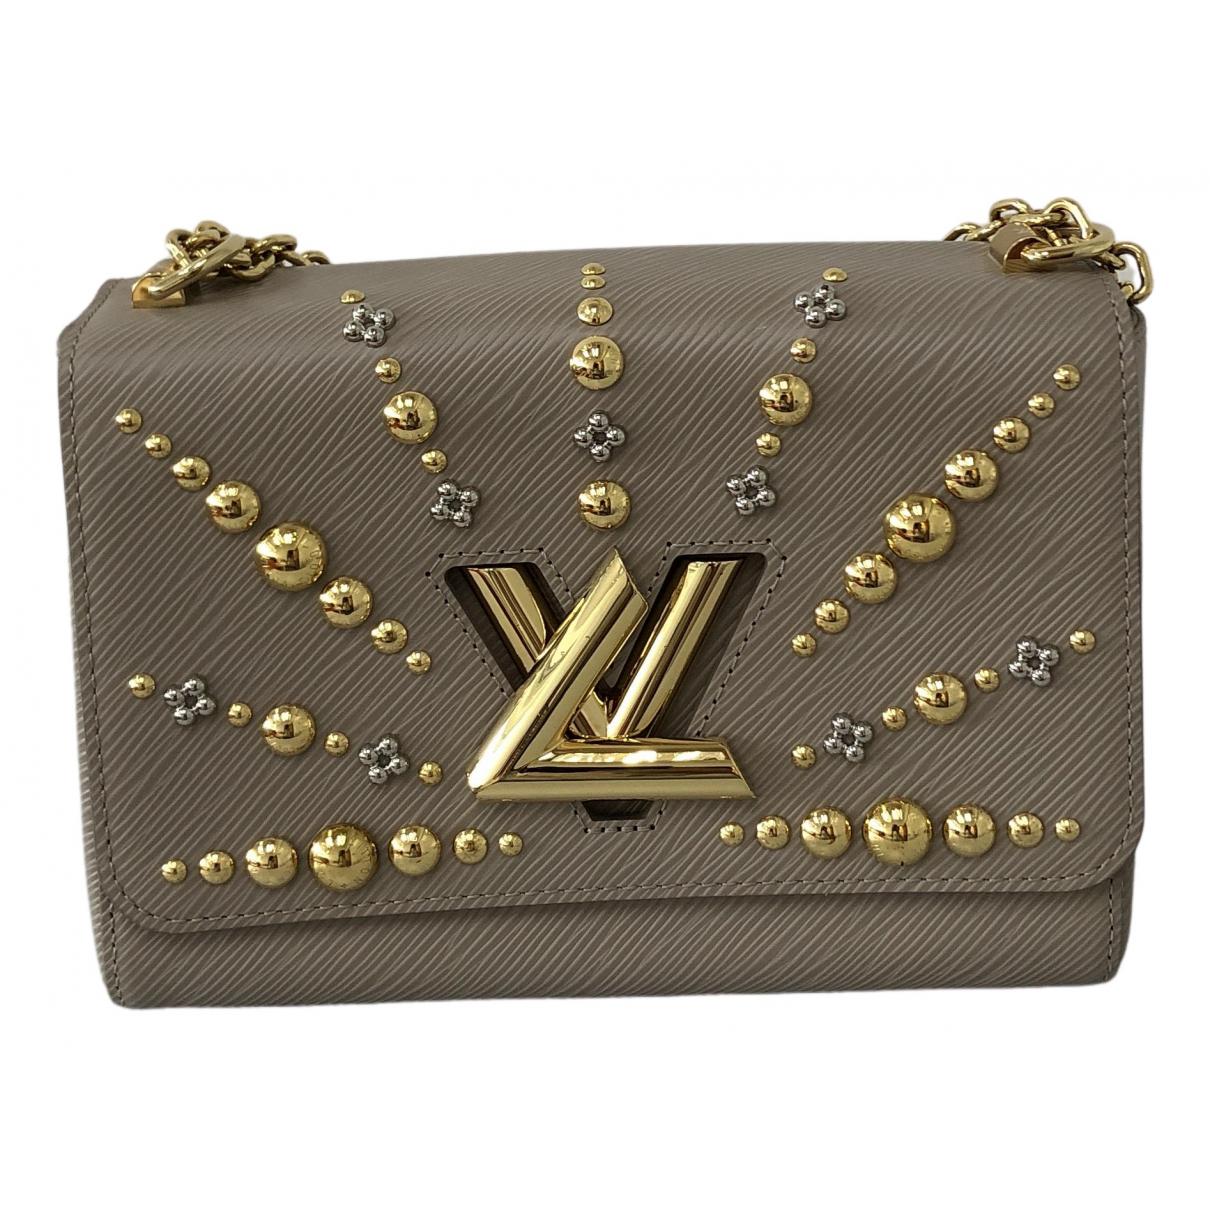 Louis Vuitton Twist Beige Leather handbag for Women \N